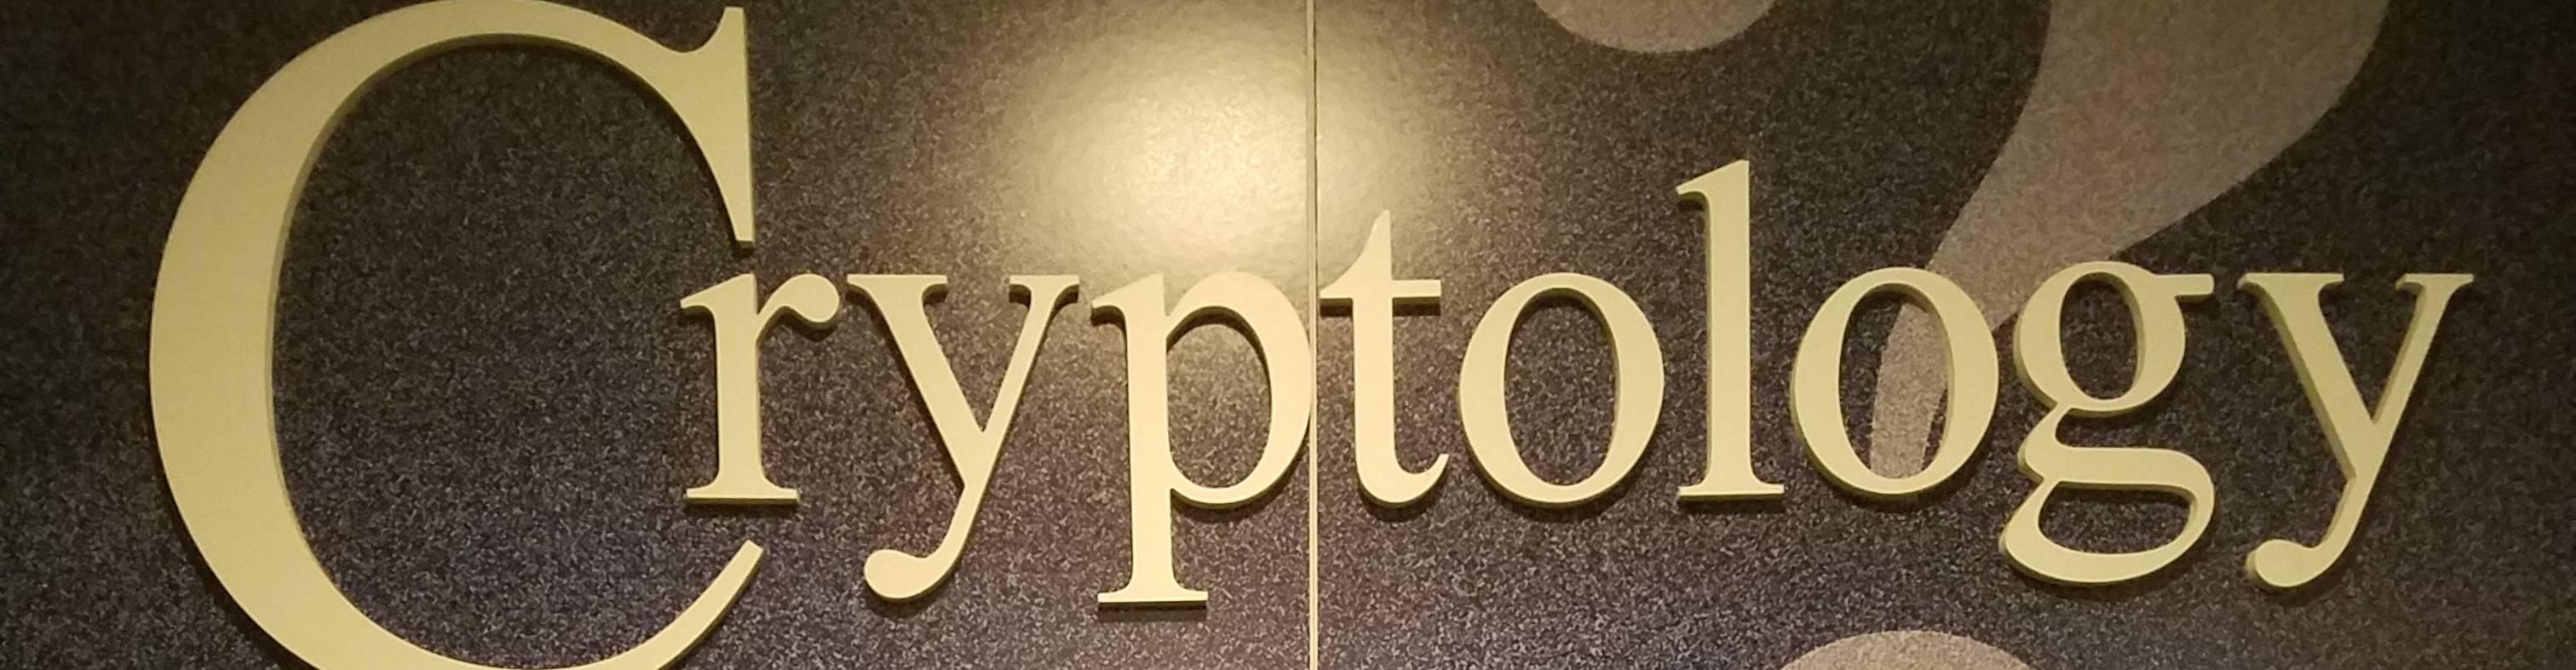 virmuze exhibit What Is Cryptology? logo main banner